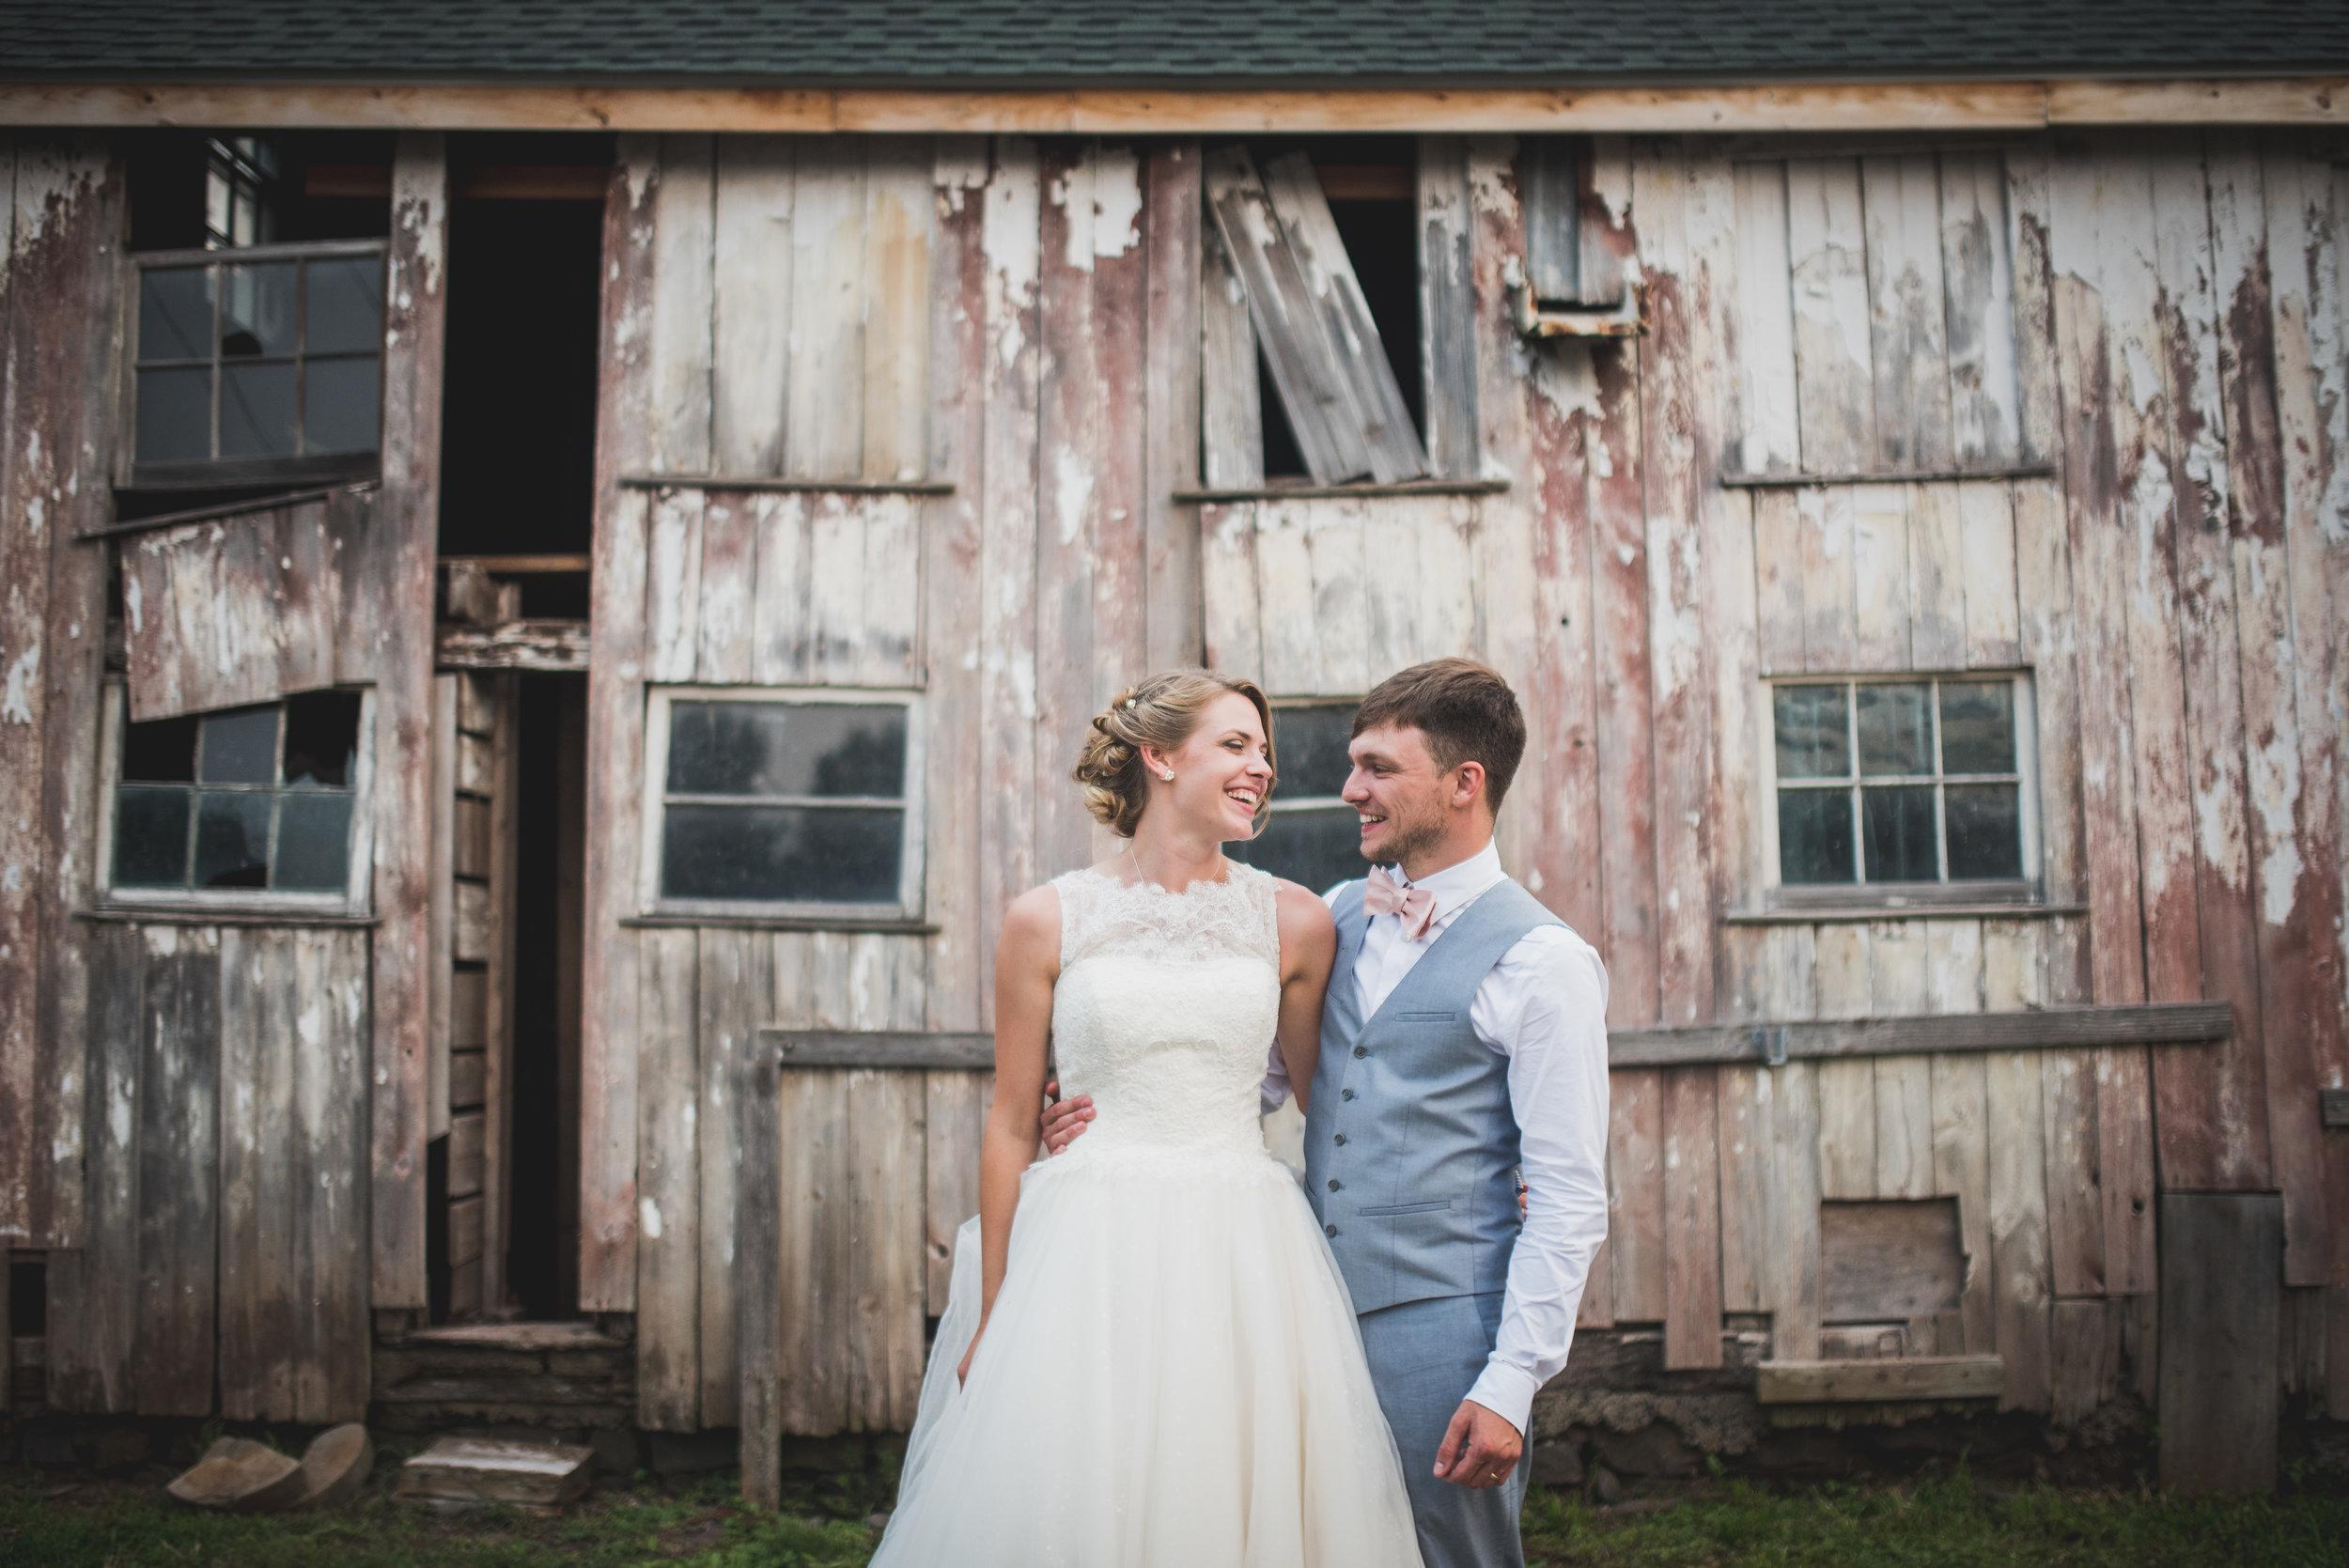 Nashville-Wedding-Photographer-Favorites138.jpg